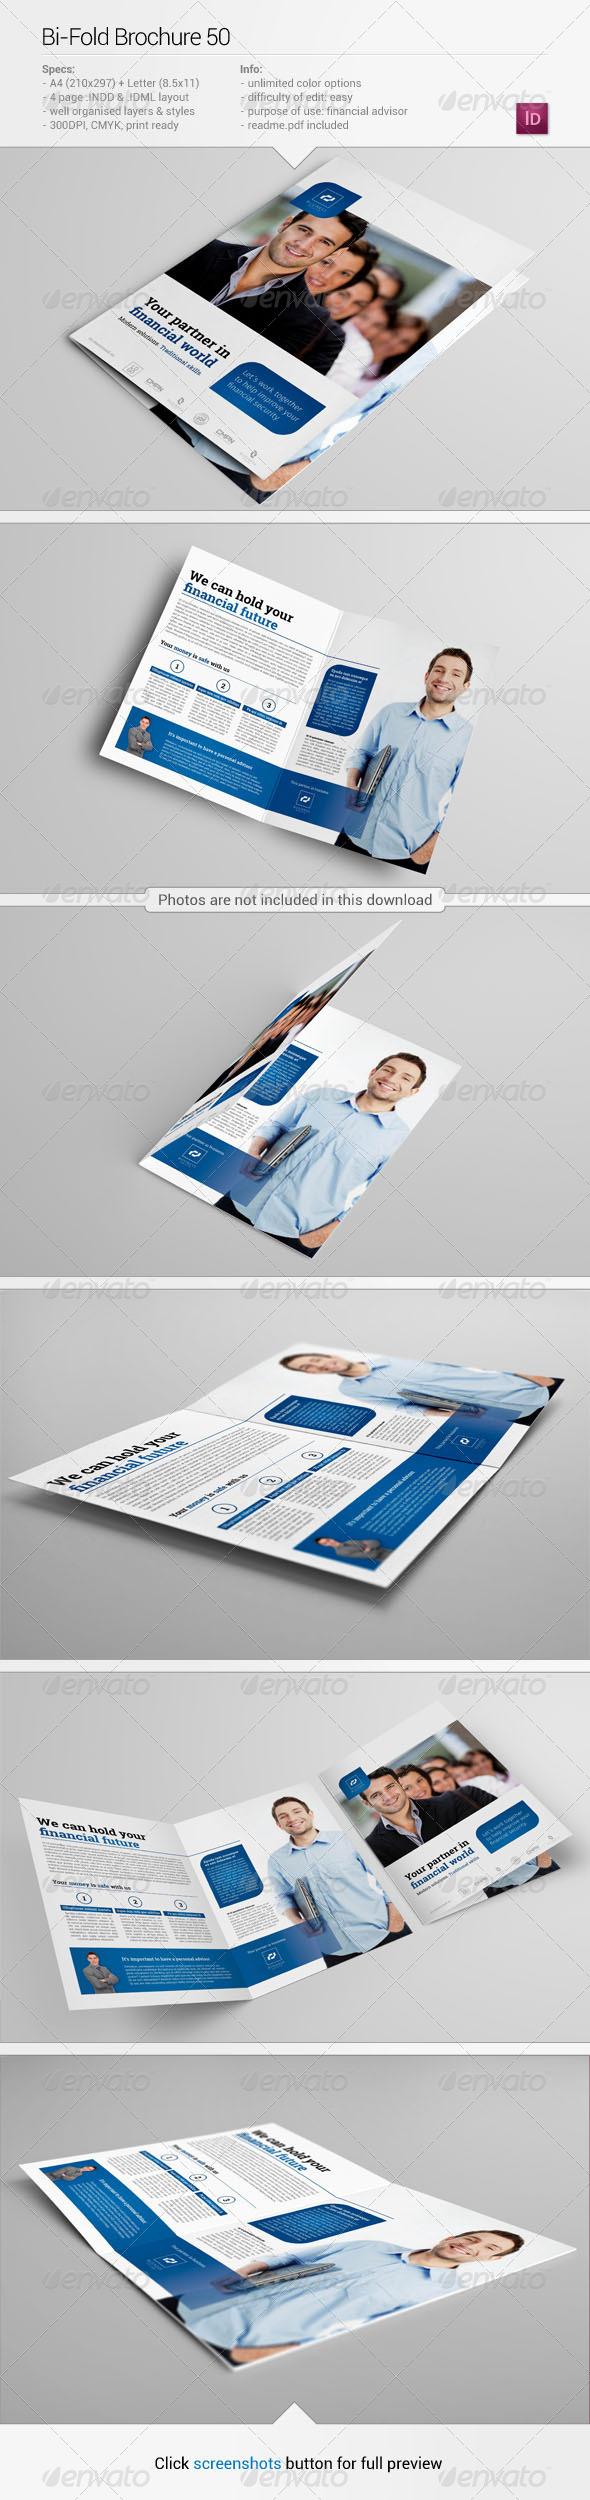 GraphicRiver Bi-Fold Brochure 50 6346716